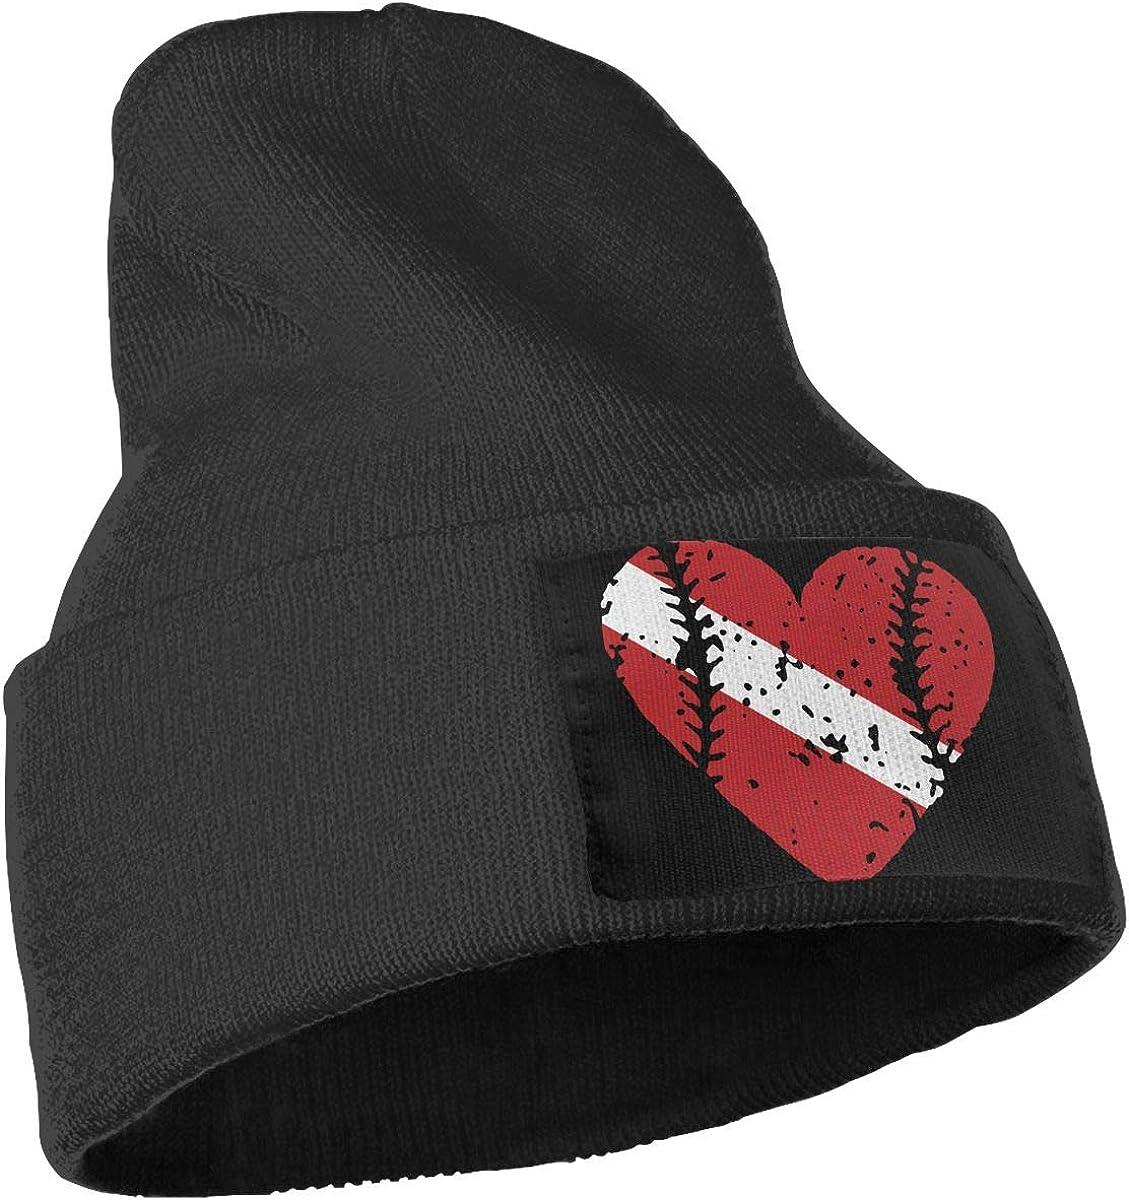 Baseball Heart Dive Flag Unisex Solid Color Knit Beanie Hat Stretchy /& Soft Winter Ski Skull Cap